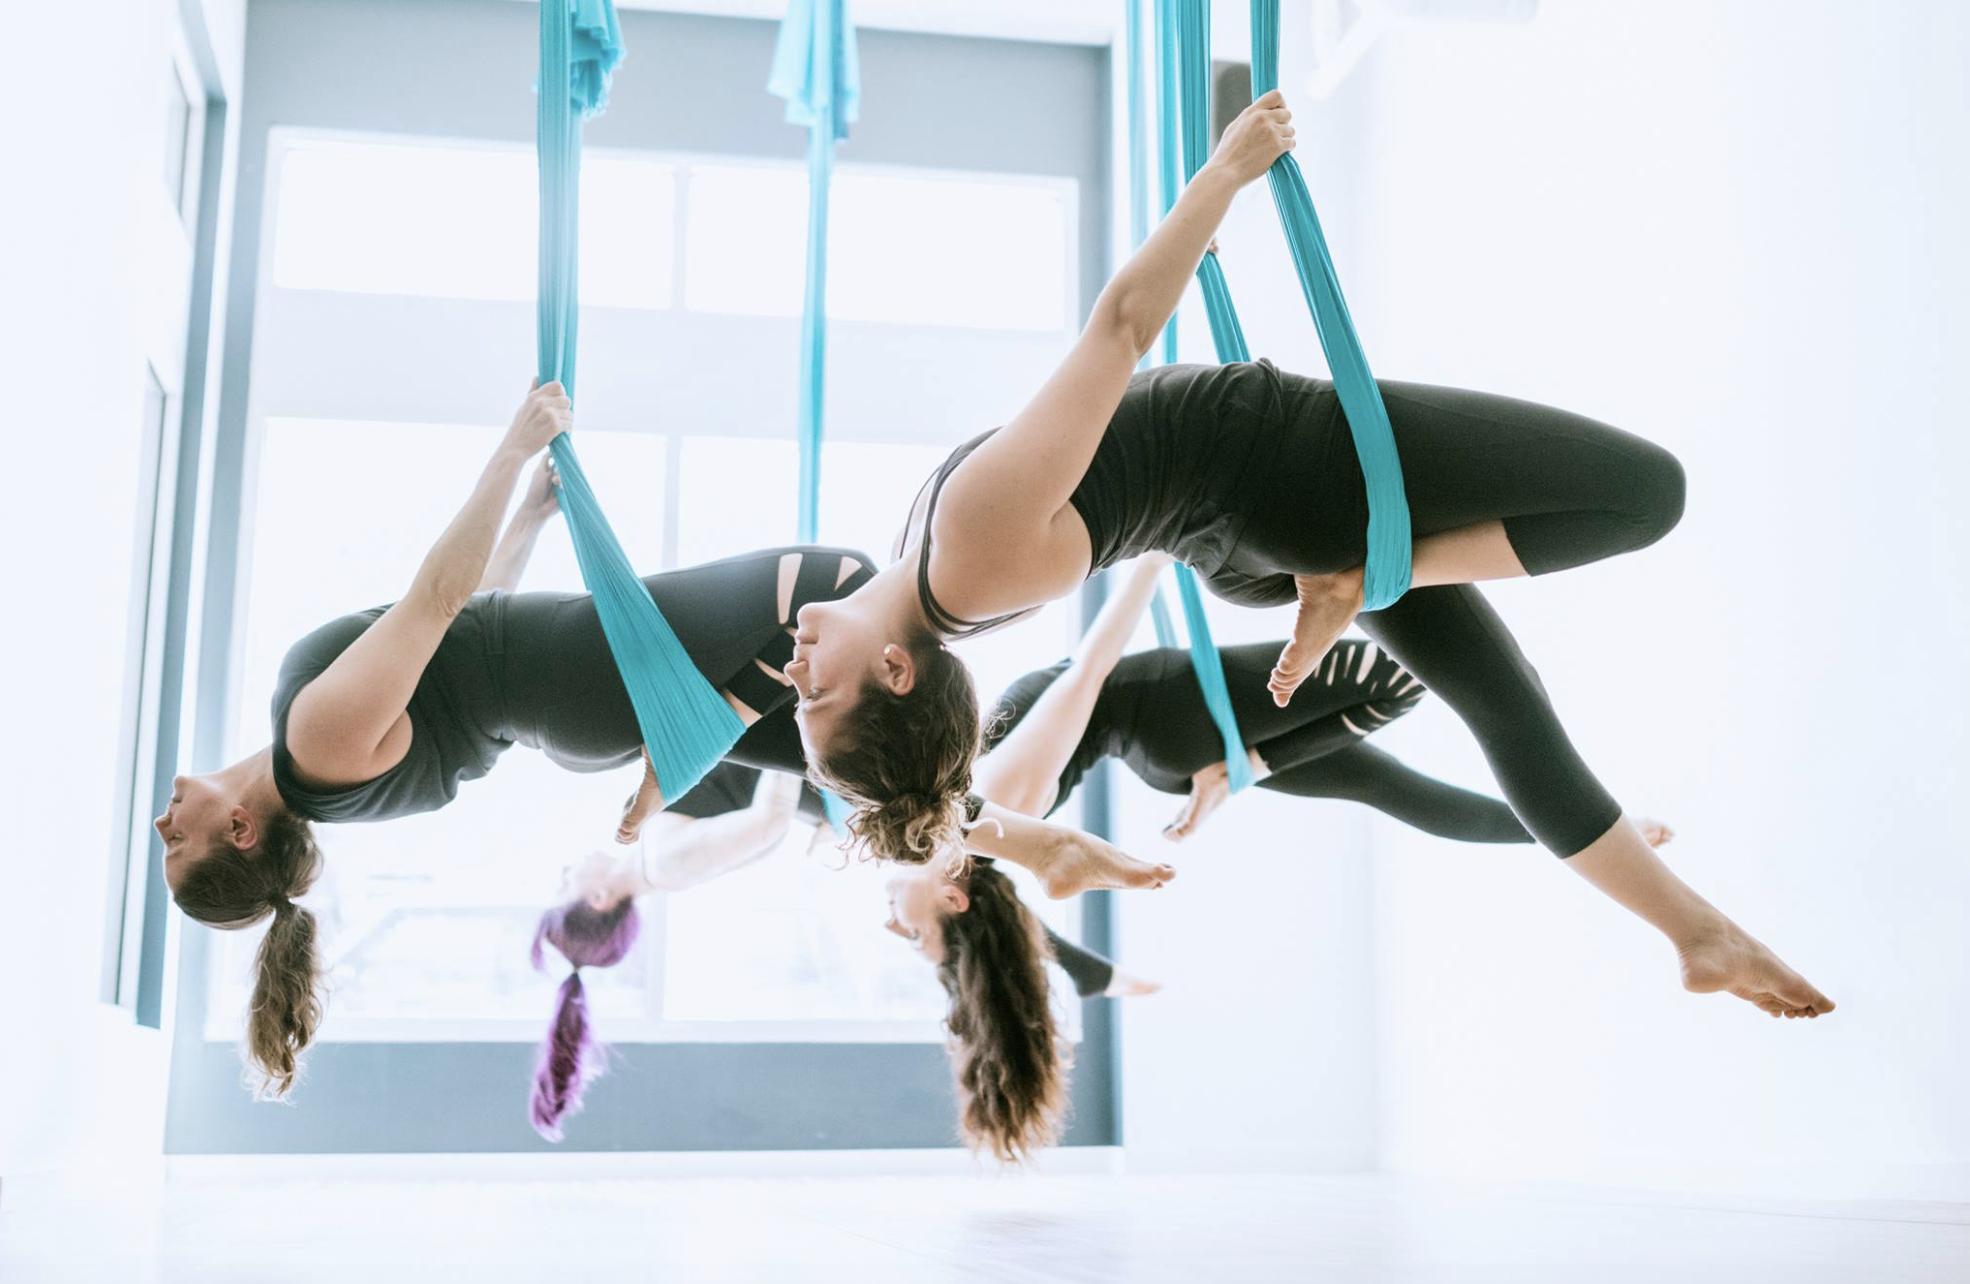 Aerial yoga studio Flight Room coming to Ballard - My Ballard